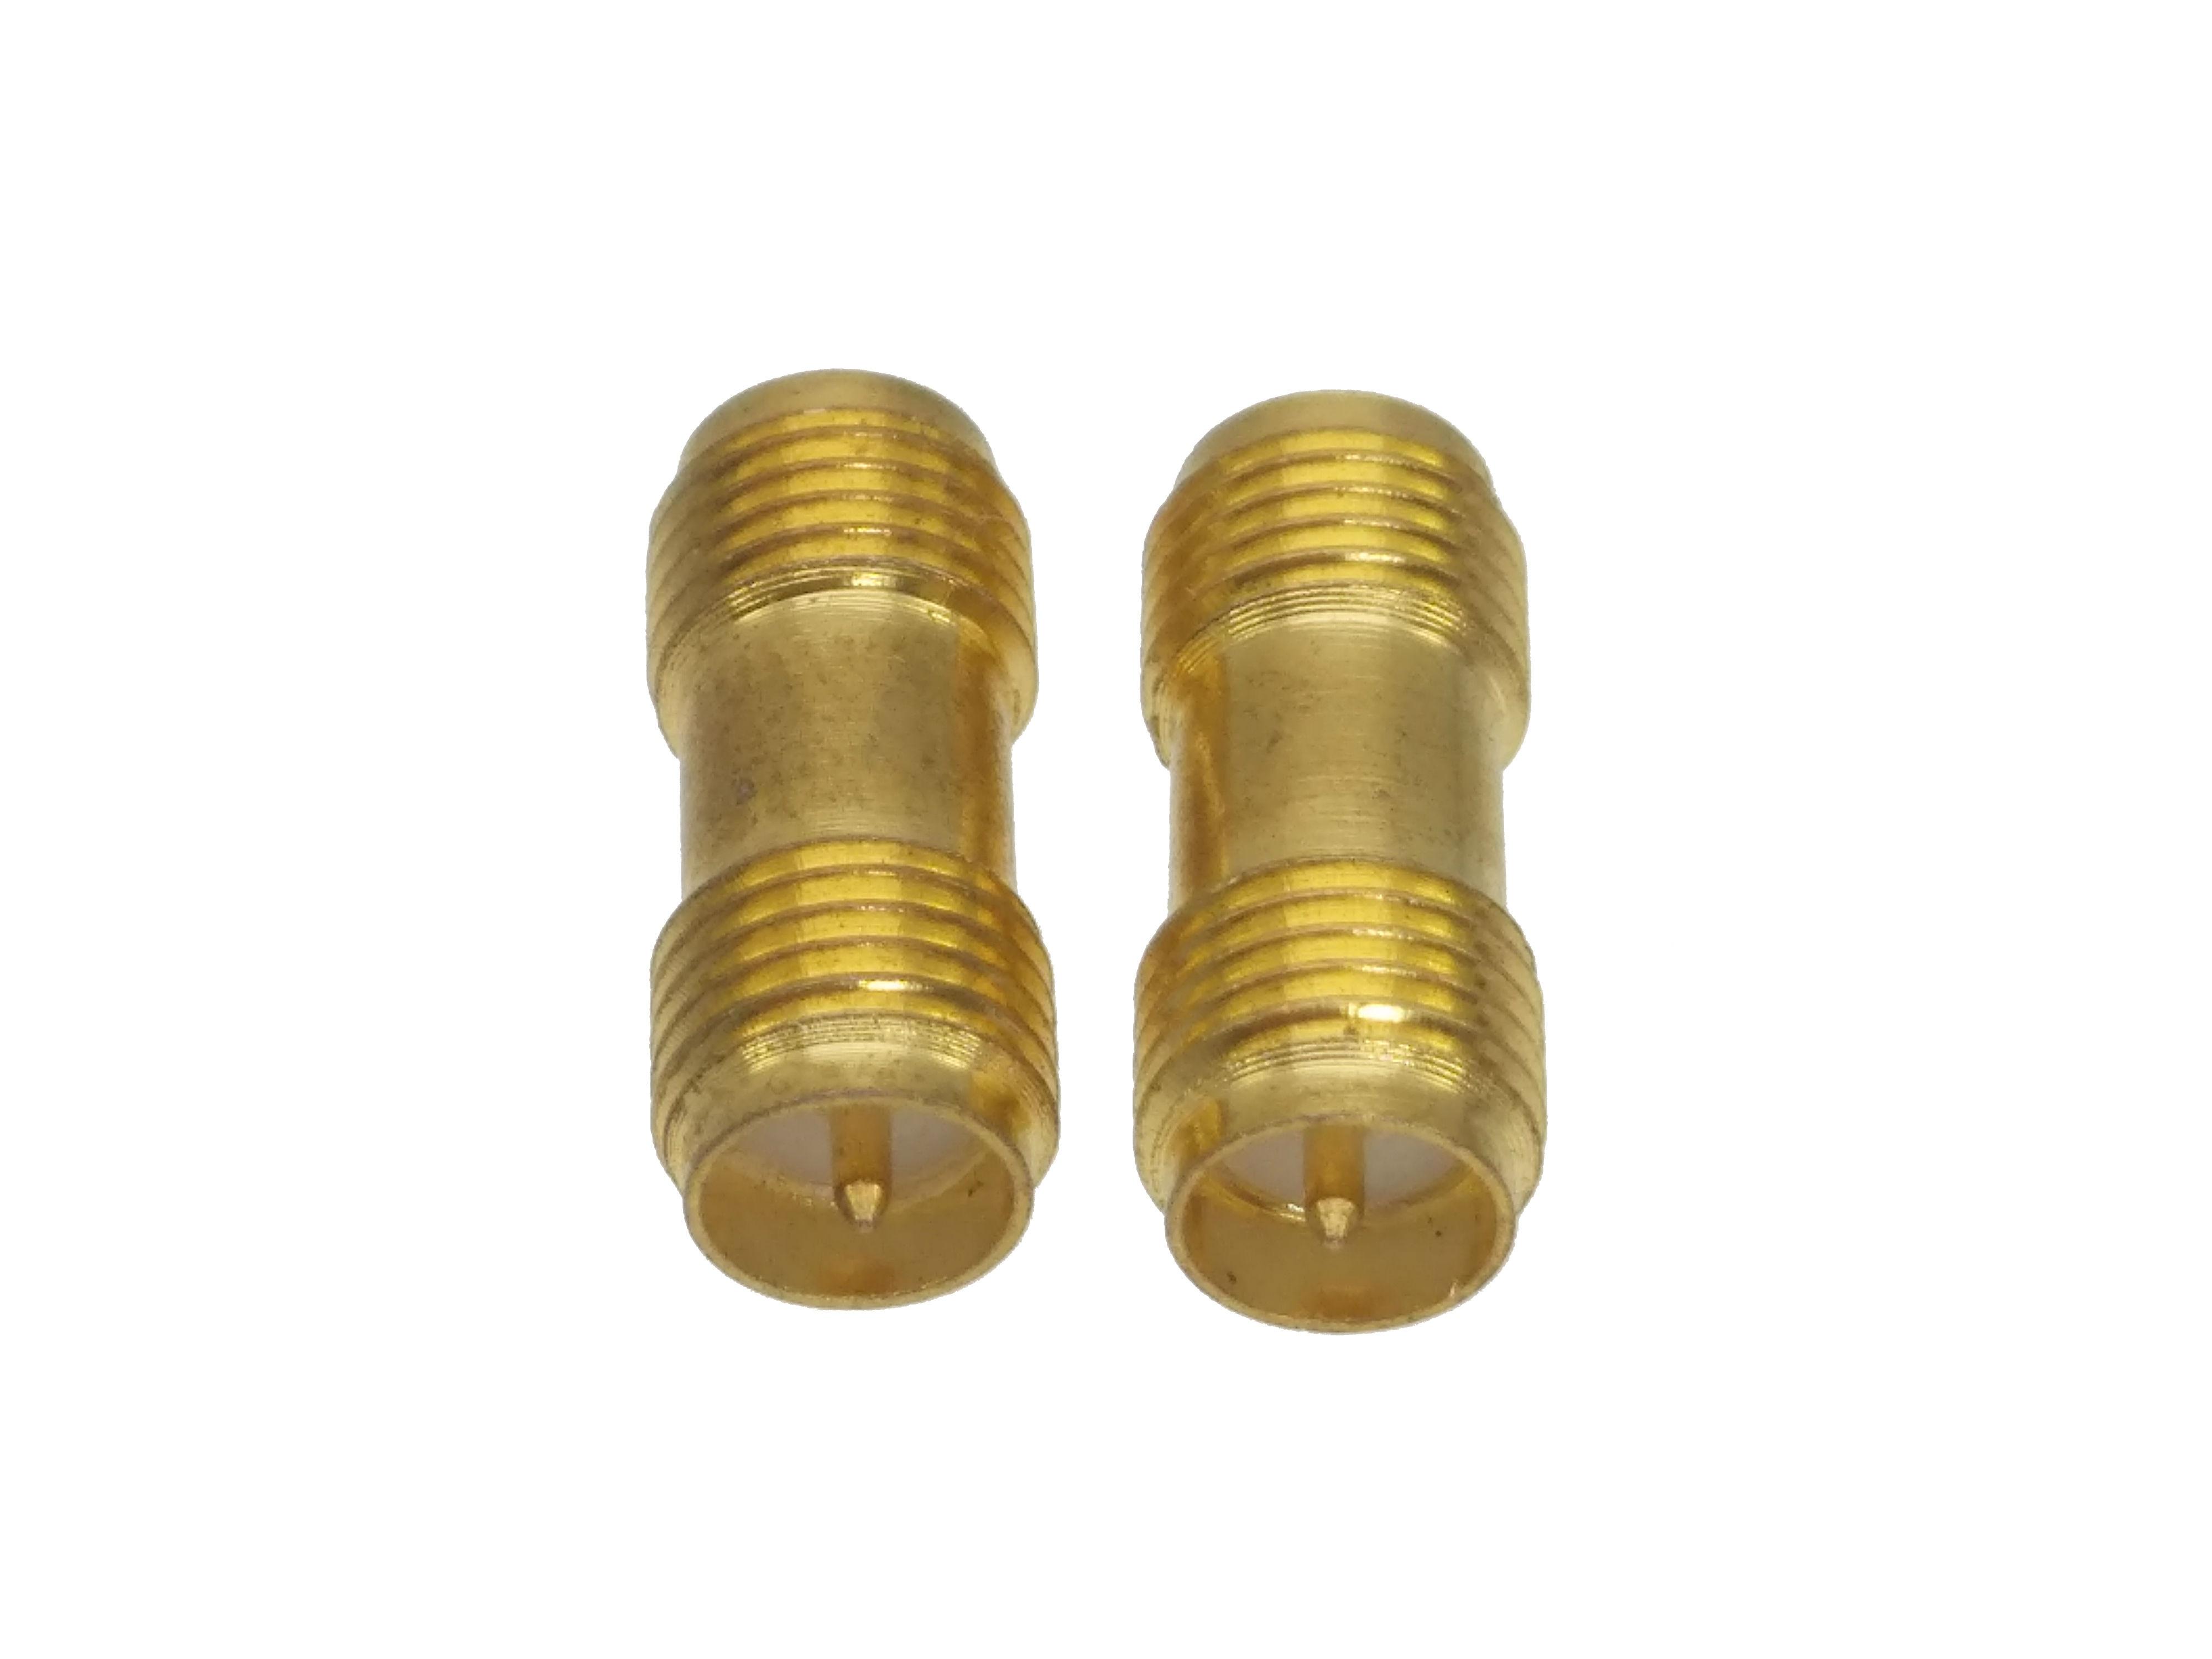 RP-SMA female plug to RP-SMA female Straight RF coaxi adapter connector